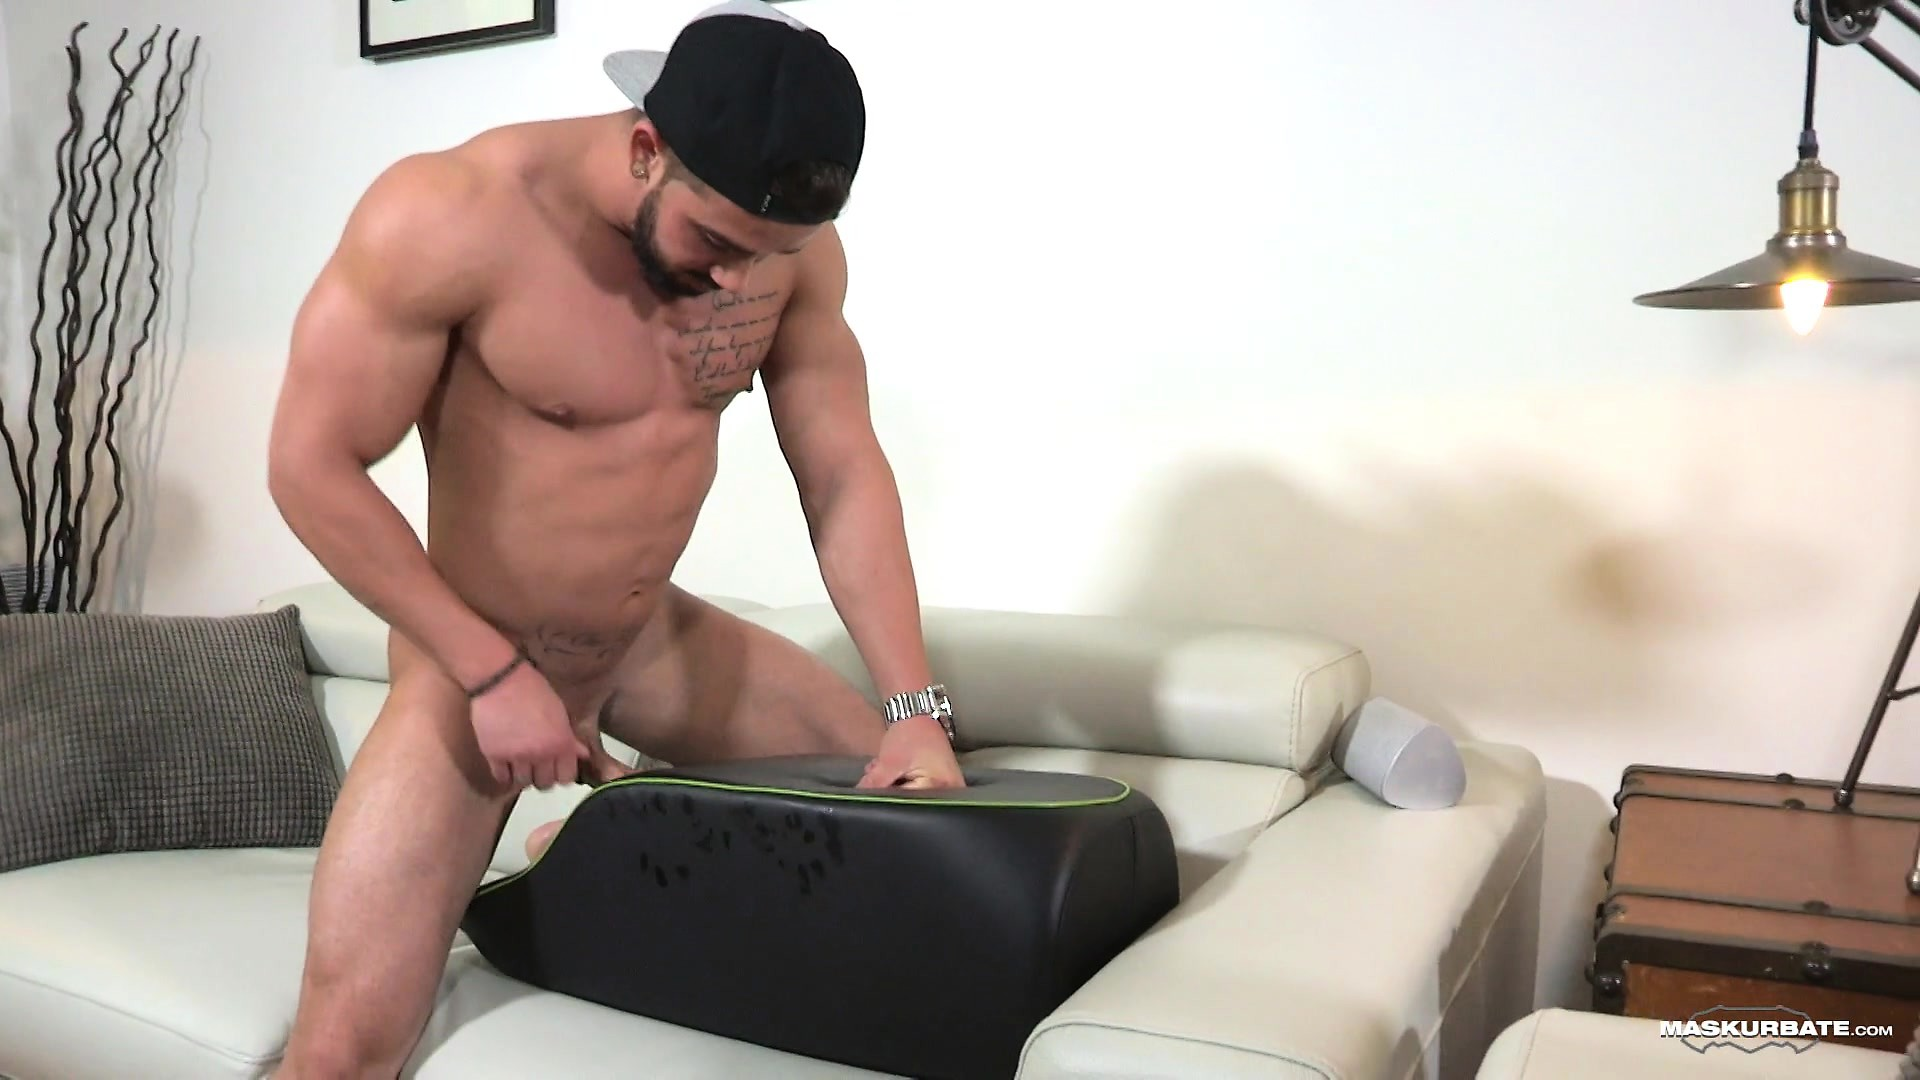 penis pump sex videos sucking my friends big cock